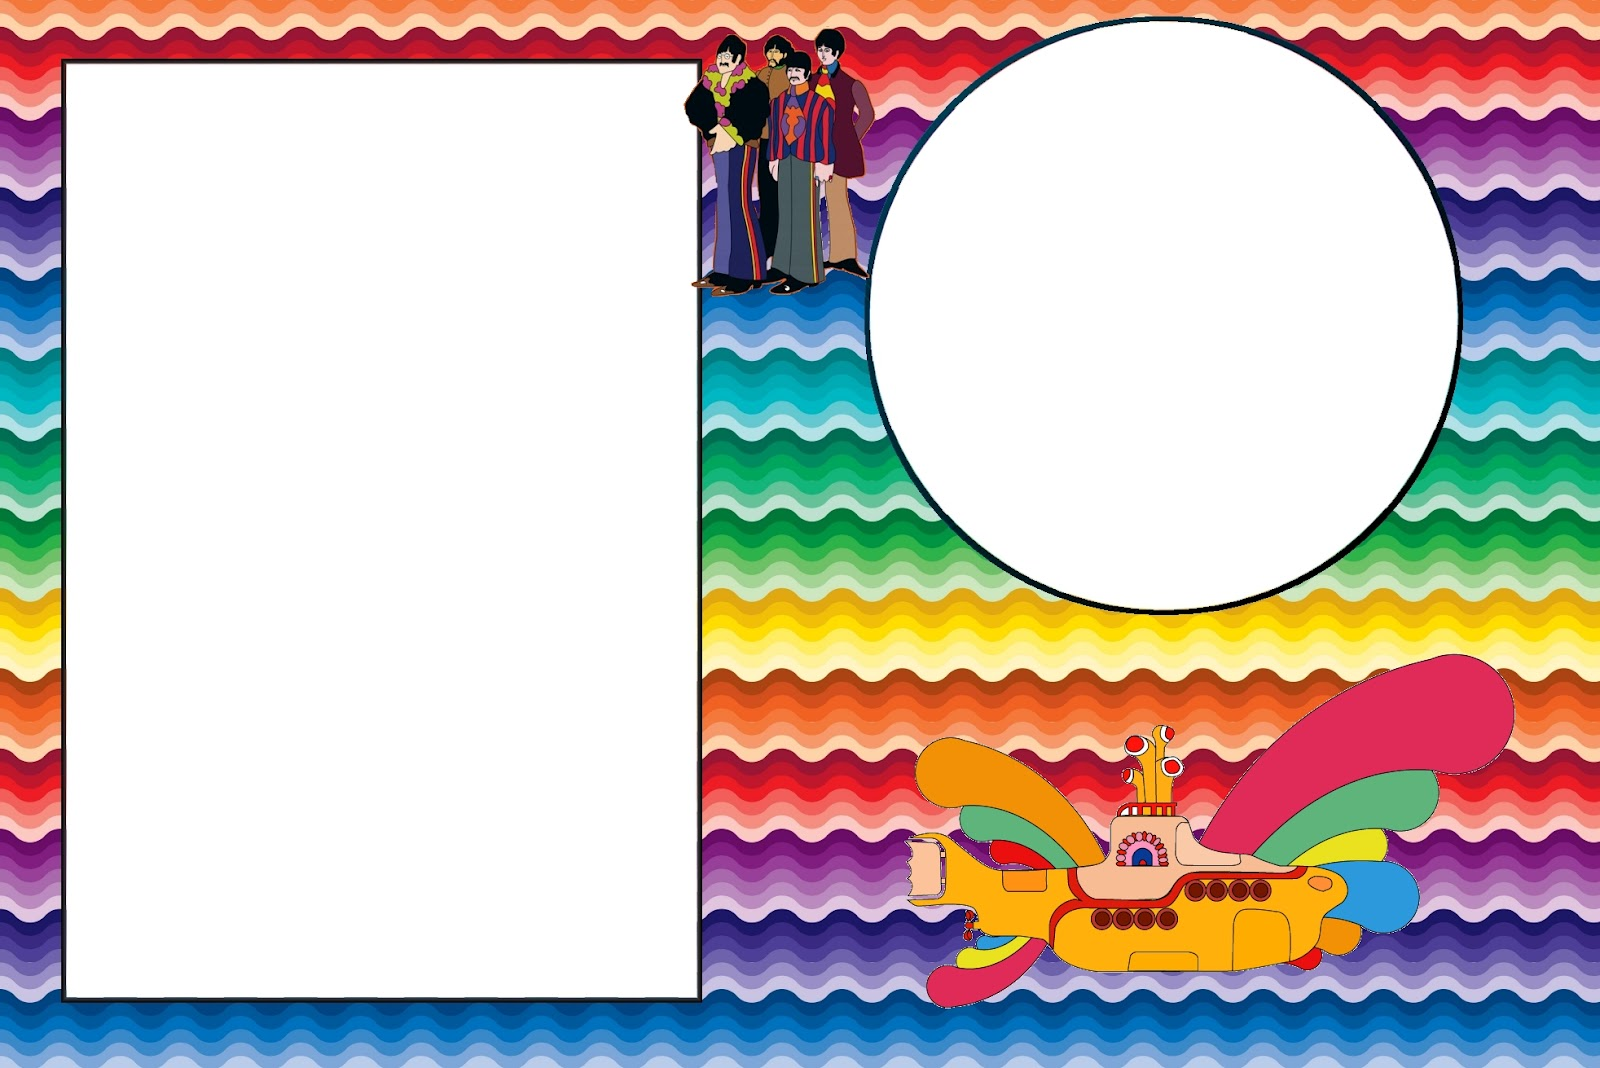 Beatles Yellow Submarine Free Printable Invitations Oh My Fiesta